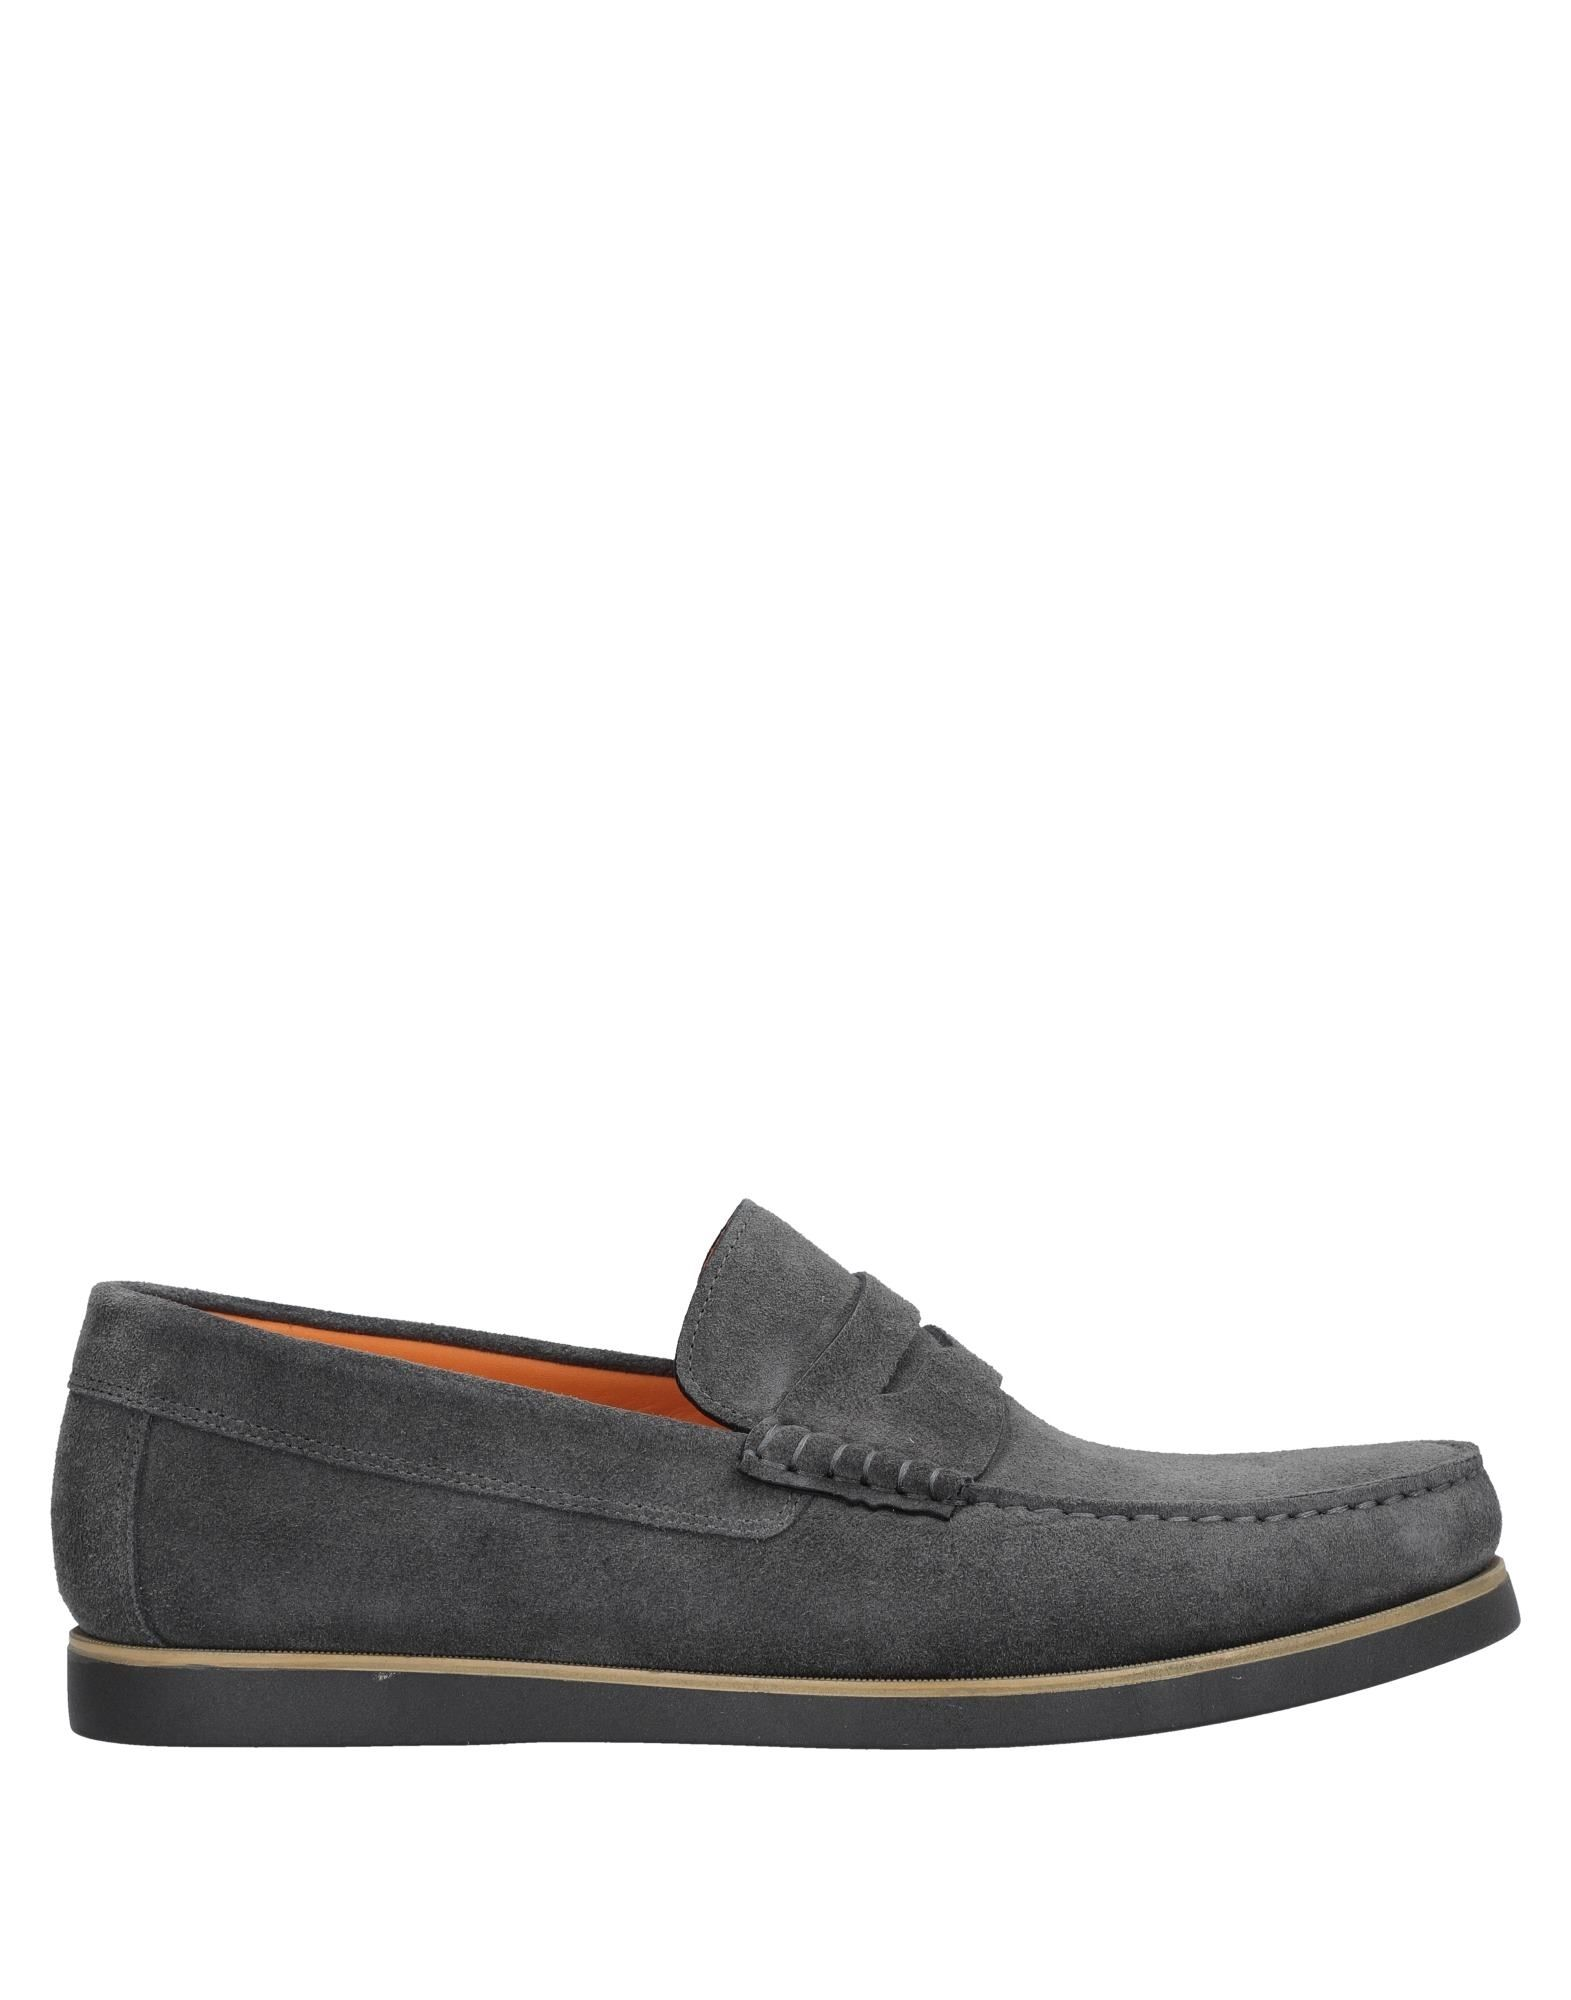 Pellettieri Di  Parma Mokassins Herren  11538054DK Gute Qualität beliebte Schuhe